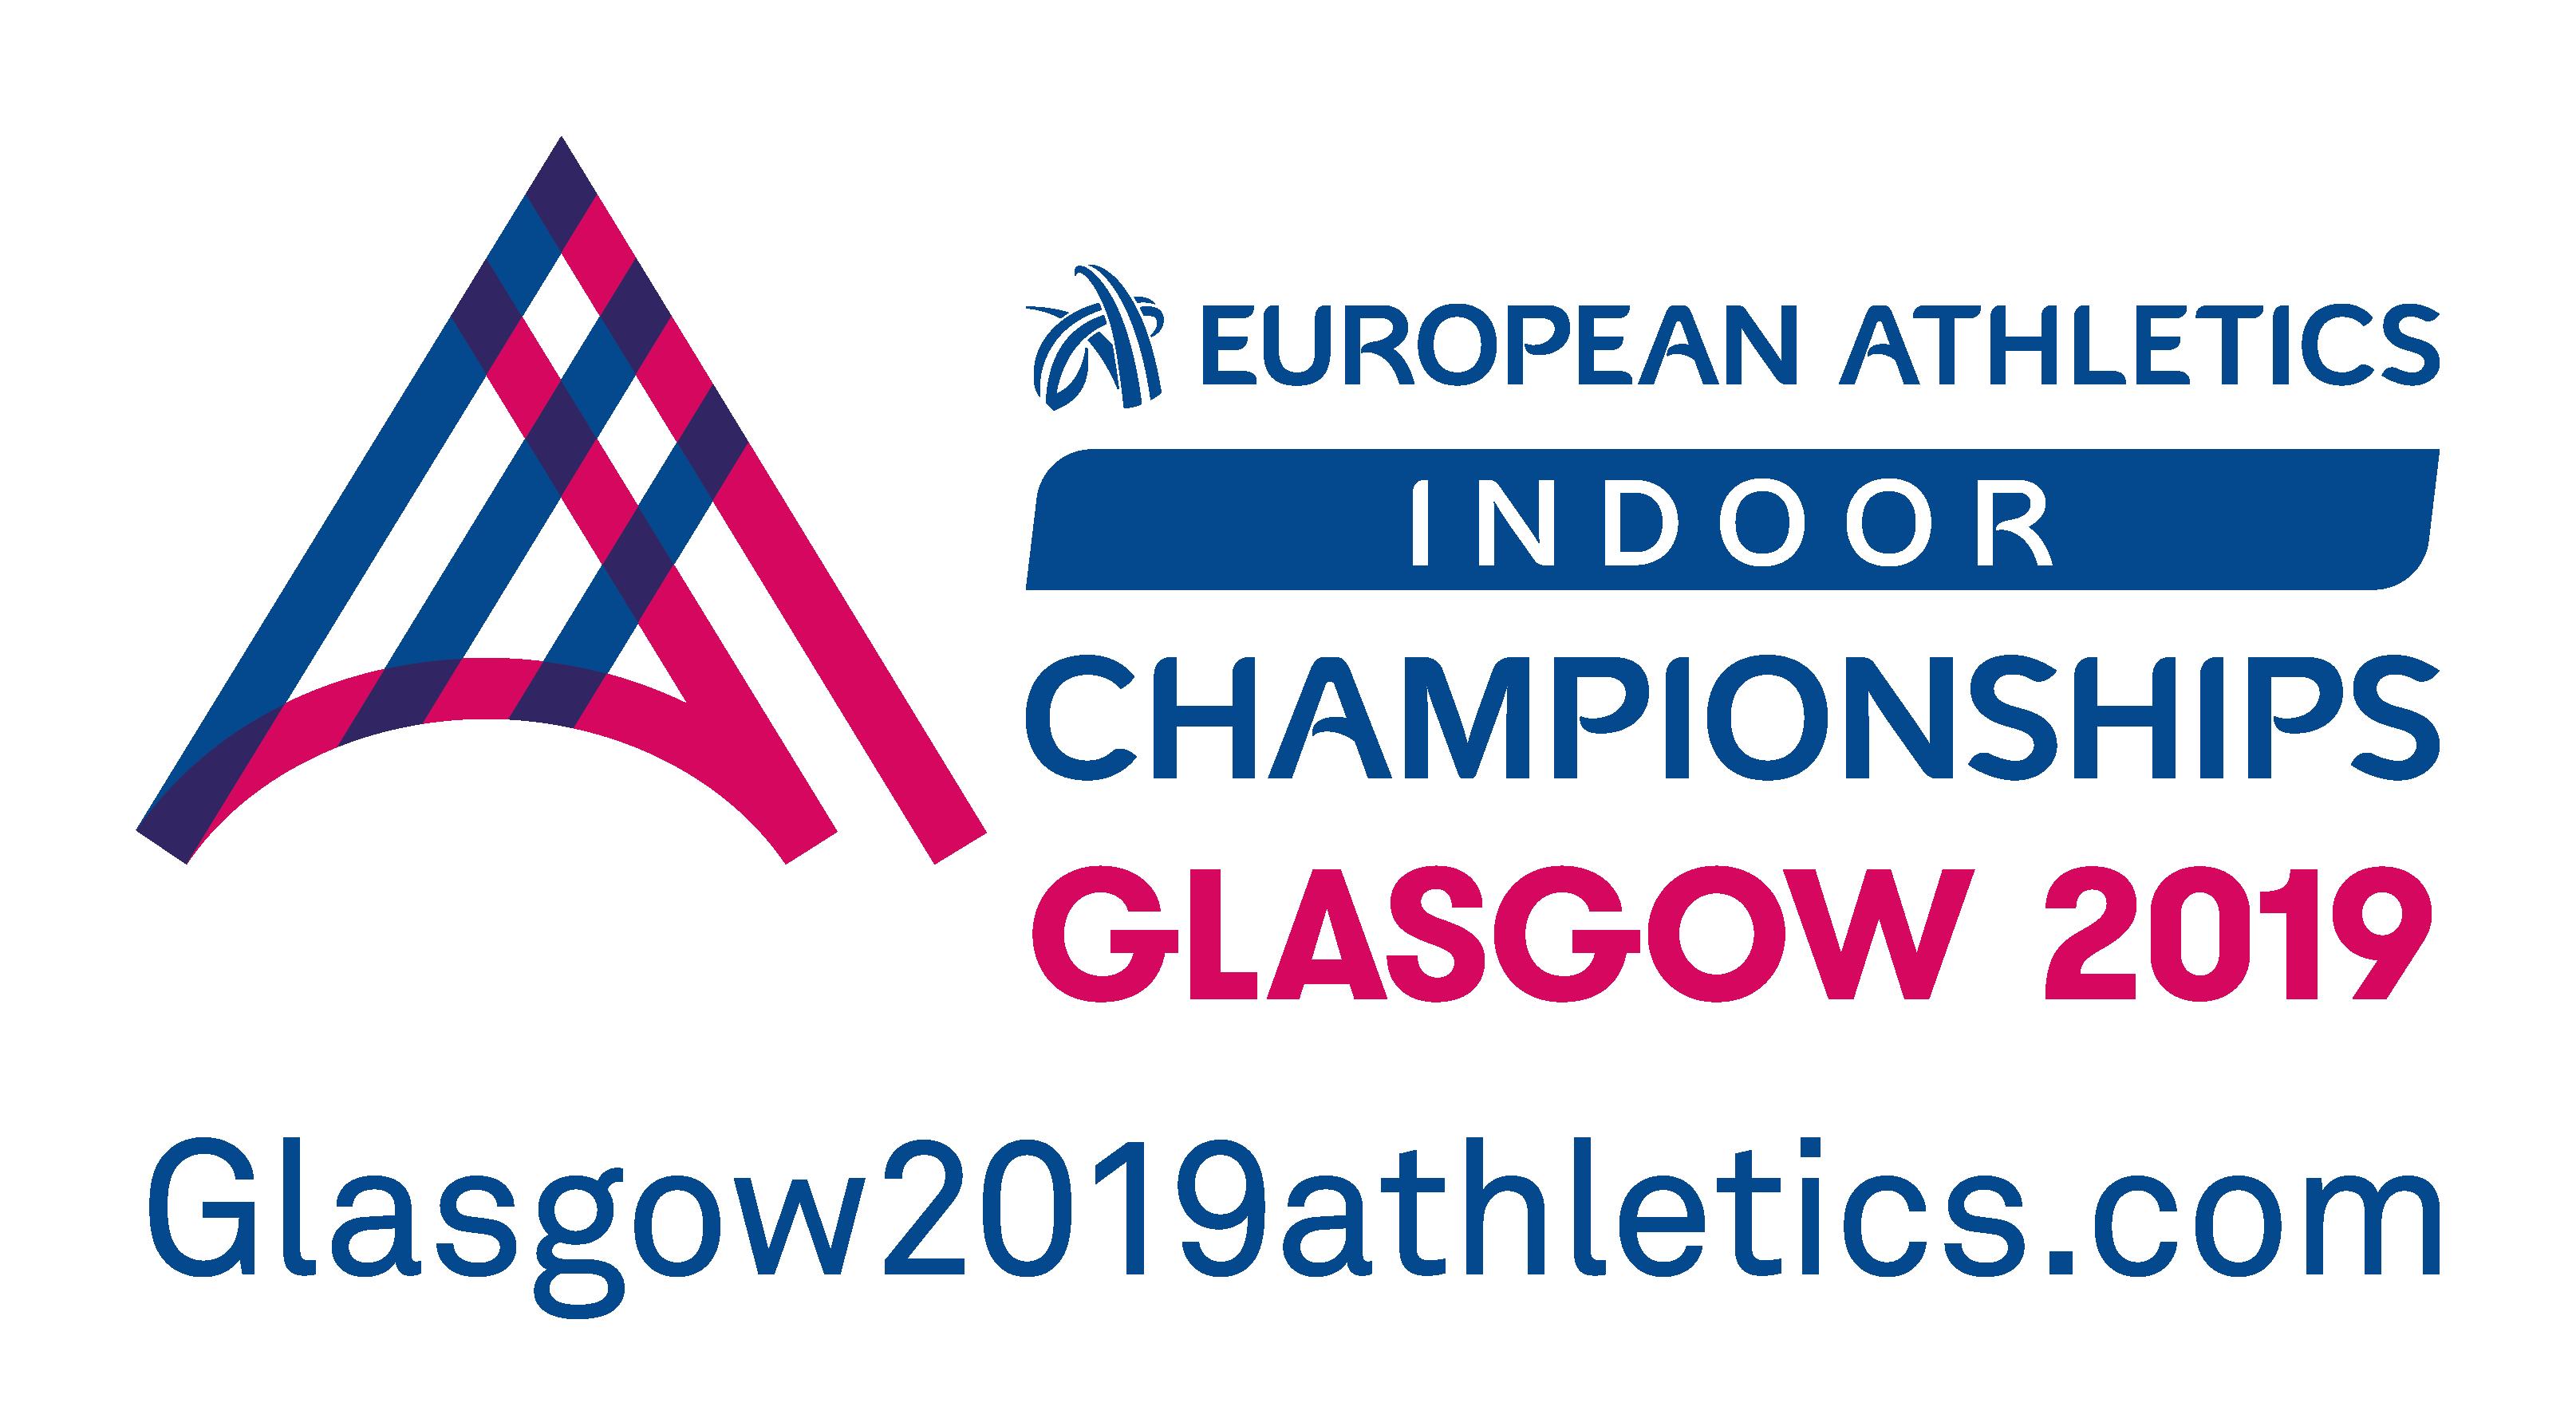 Campeonatos Europeus Atletismo Pista Coberta - Glasgow 2019